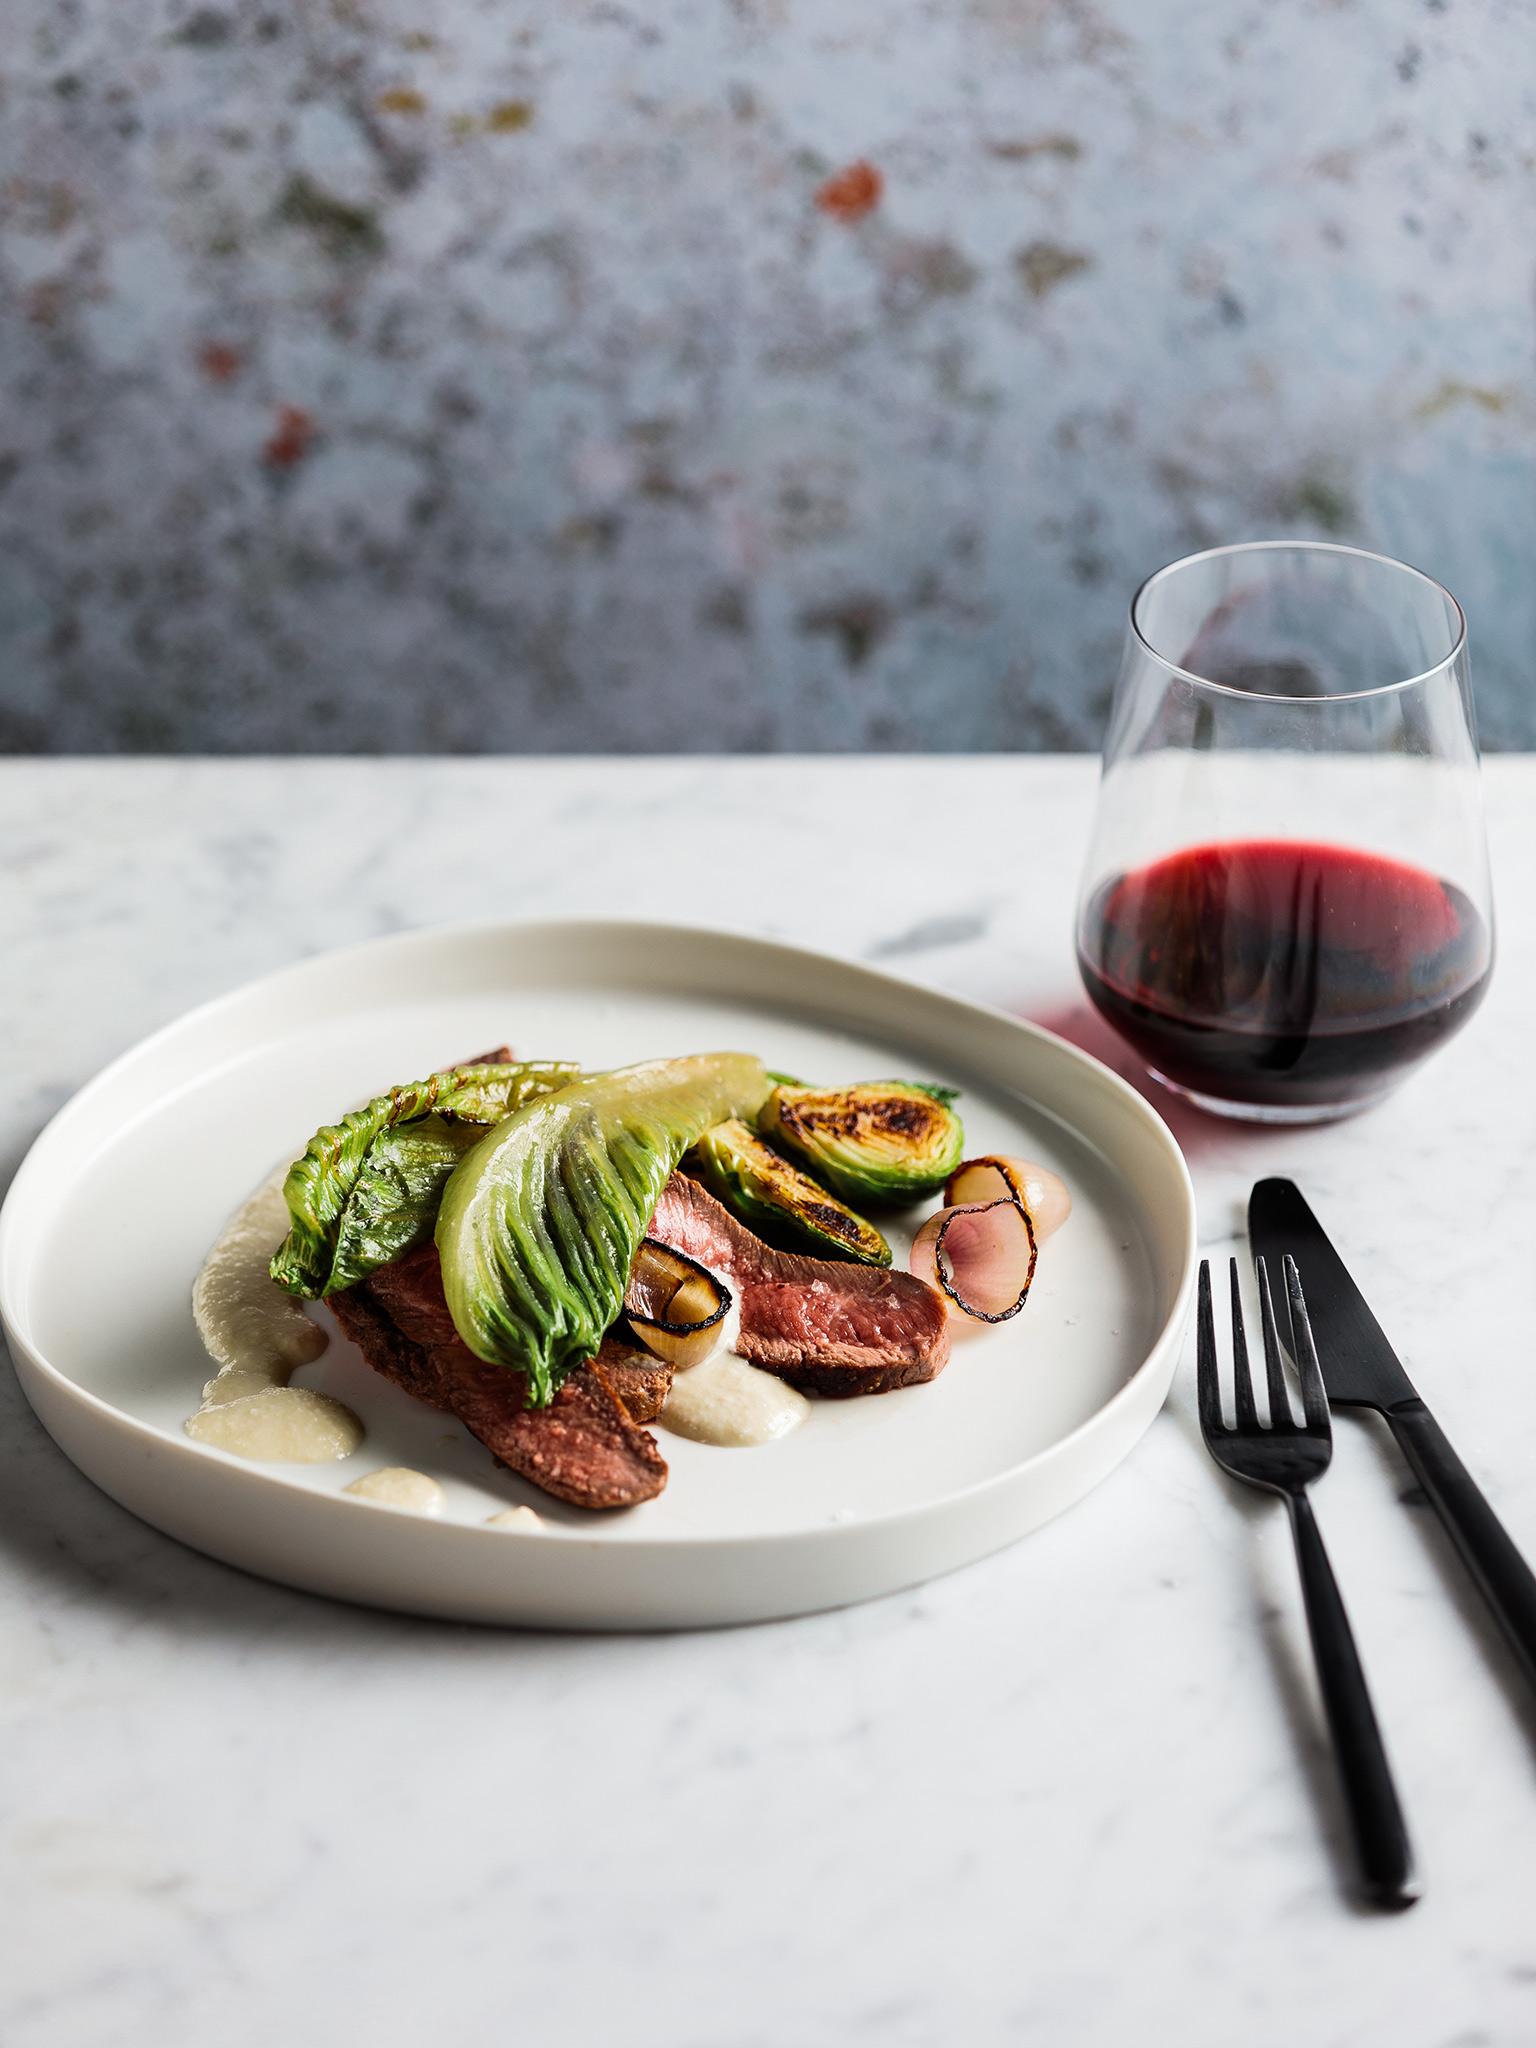 3-080-KitchenAid-Macadamia-Gazpacho-with-Lamb-Cutlets-web.jpg